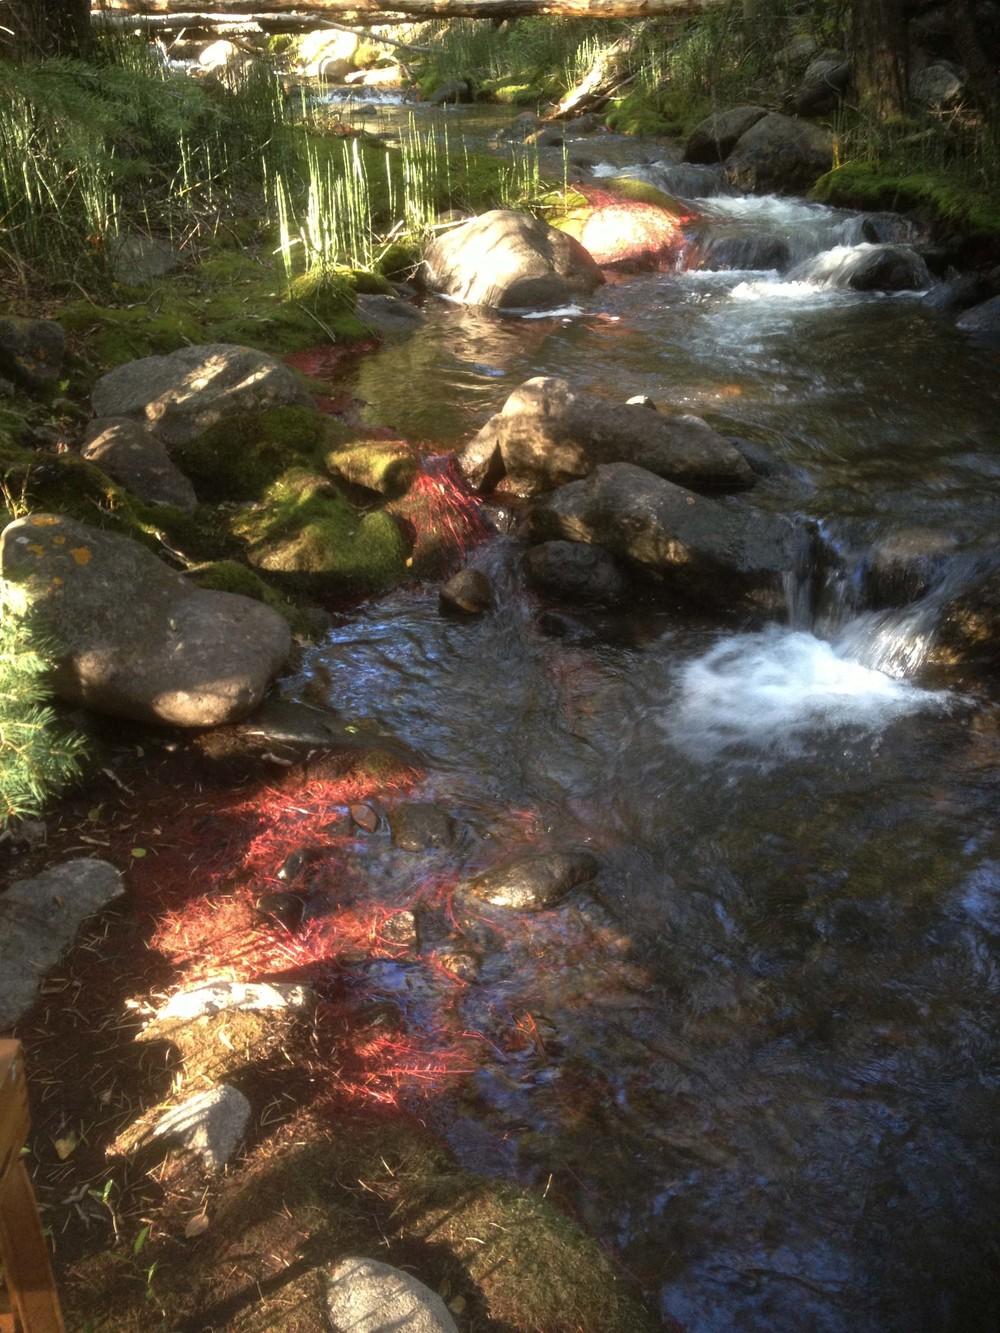 site-9.8.13 n. crestone creek 1.jpg